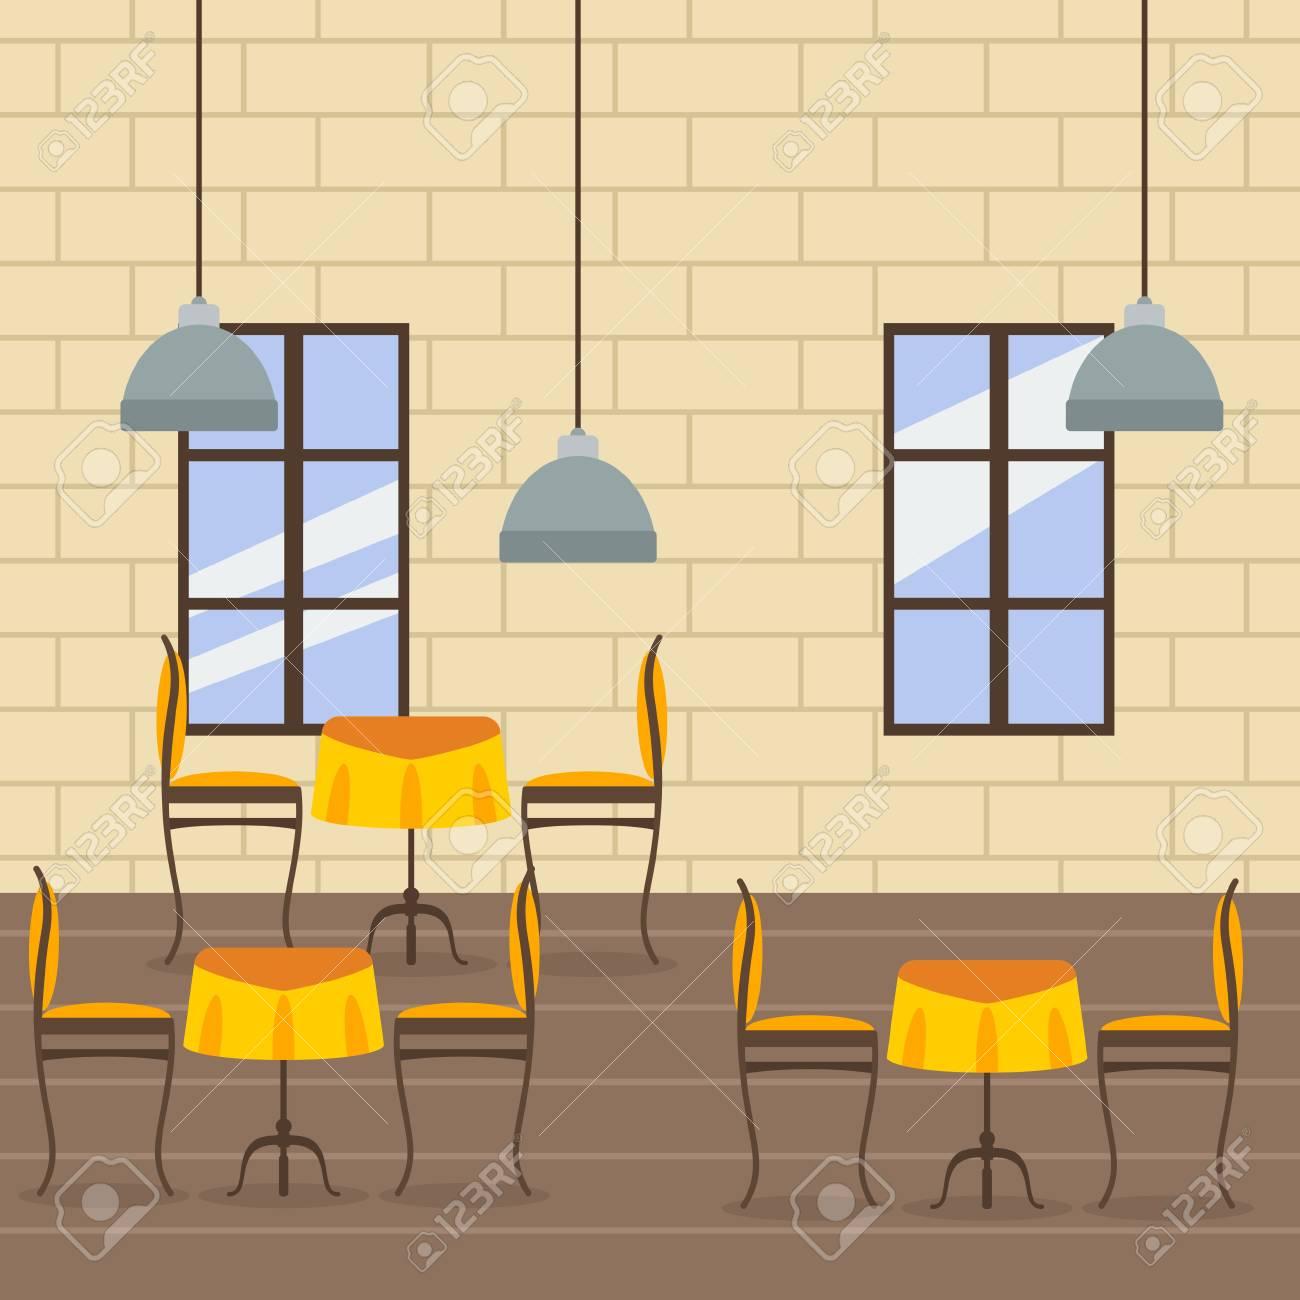 Editable Restaurant Interior Vector Illustration Royalty Free ...